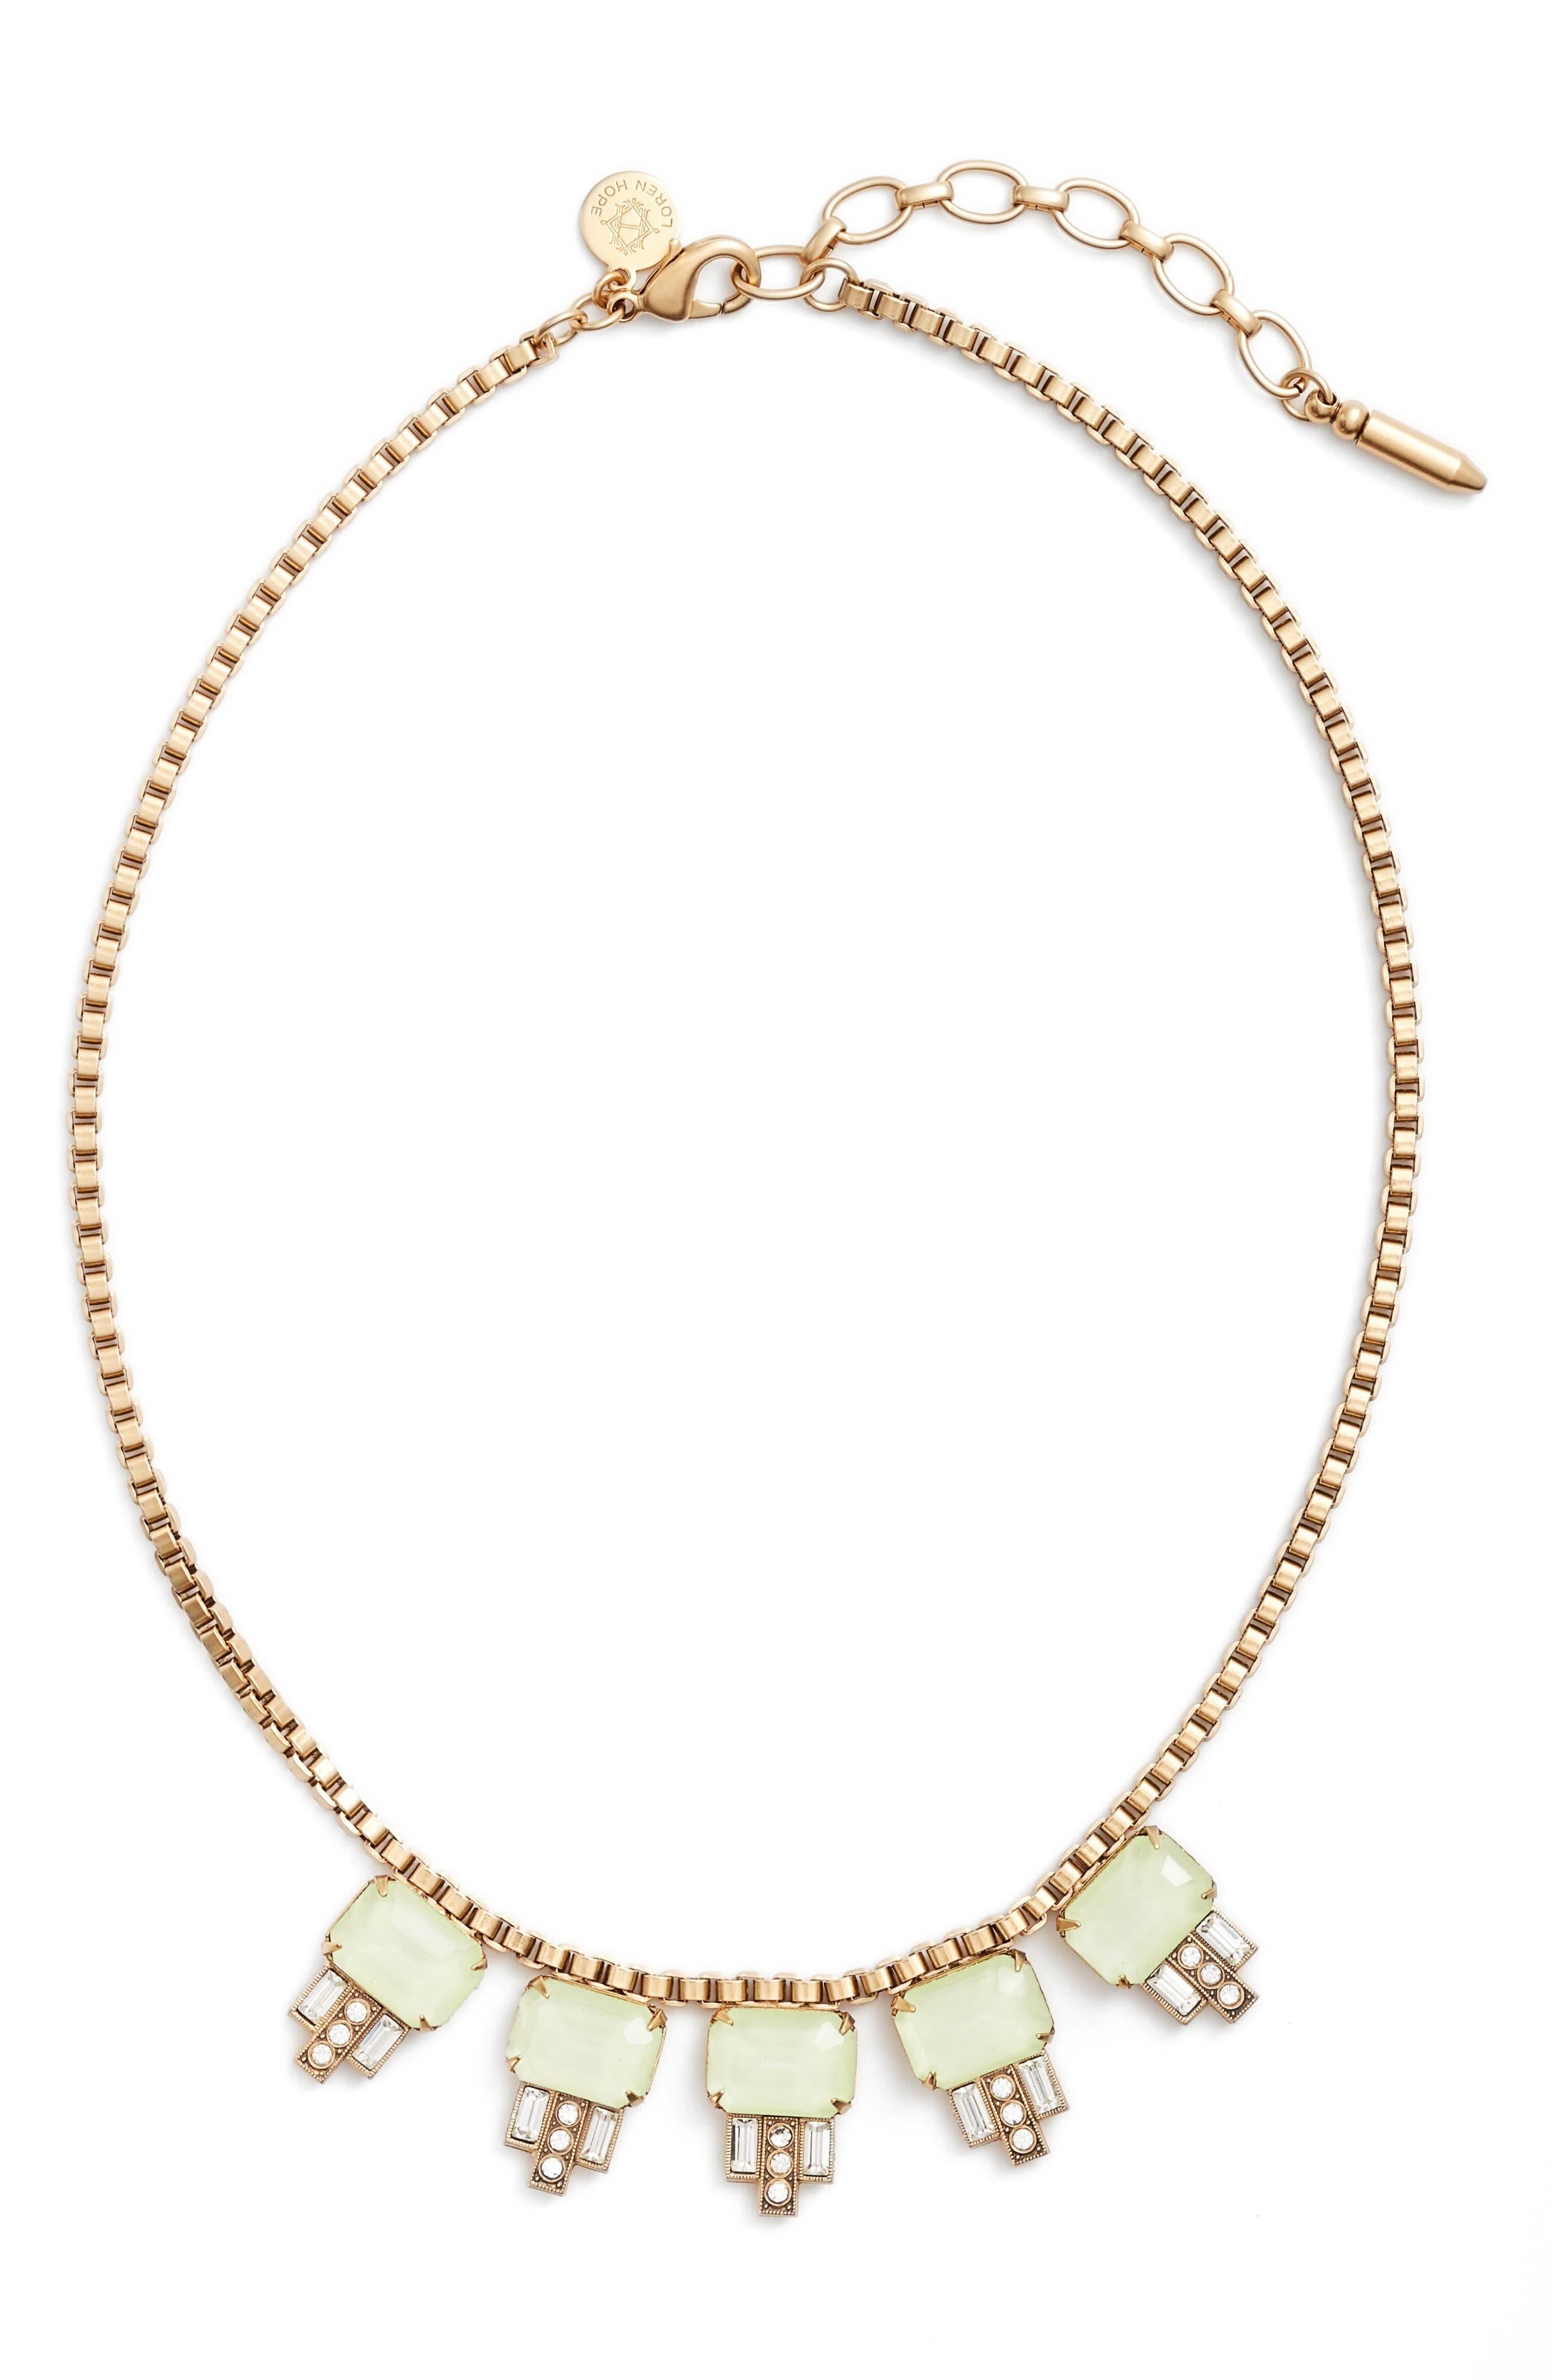 Loren Hope 'Alex' Collar Necklace